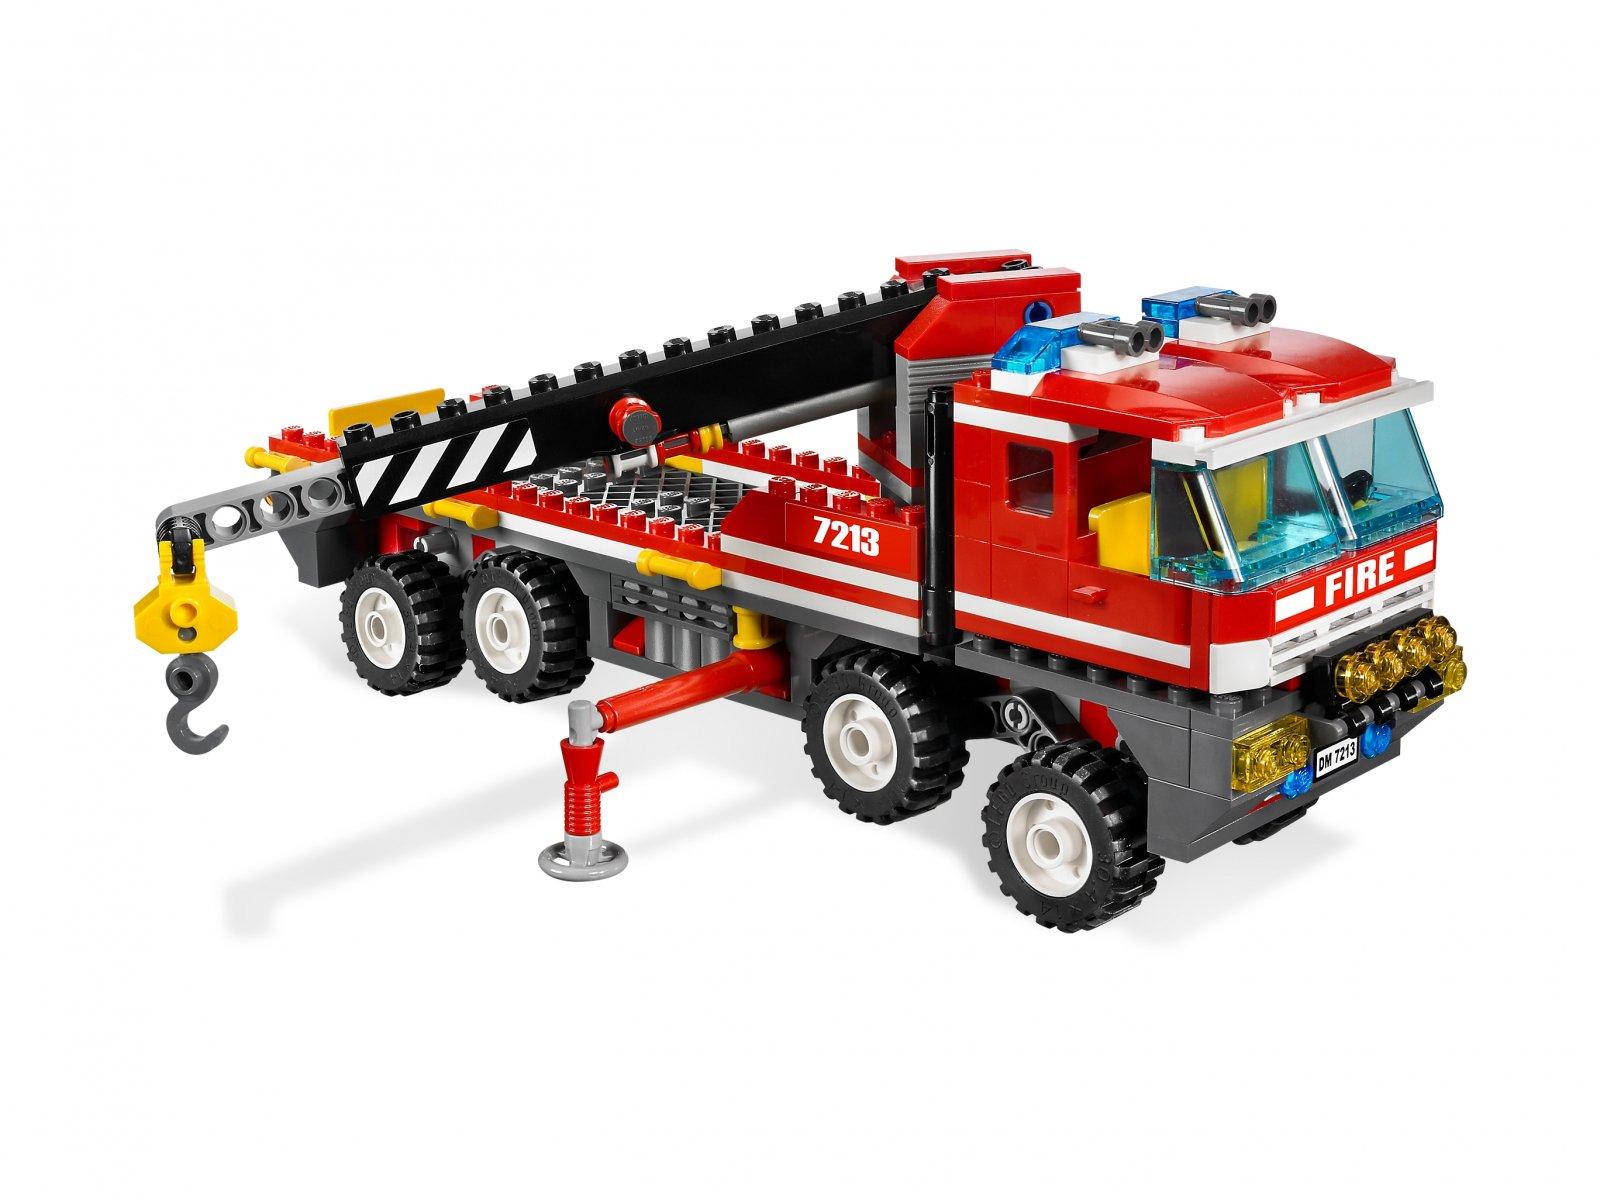 LEGO City Off-Road Fire Truck & Fireboat 7213